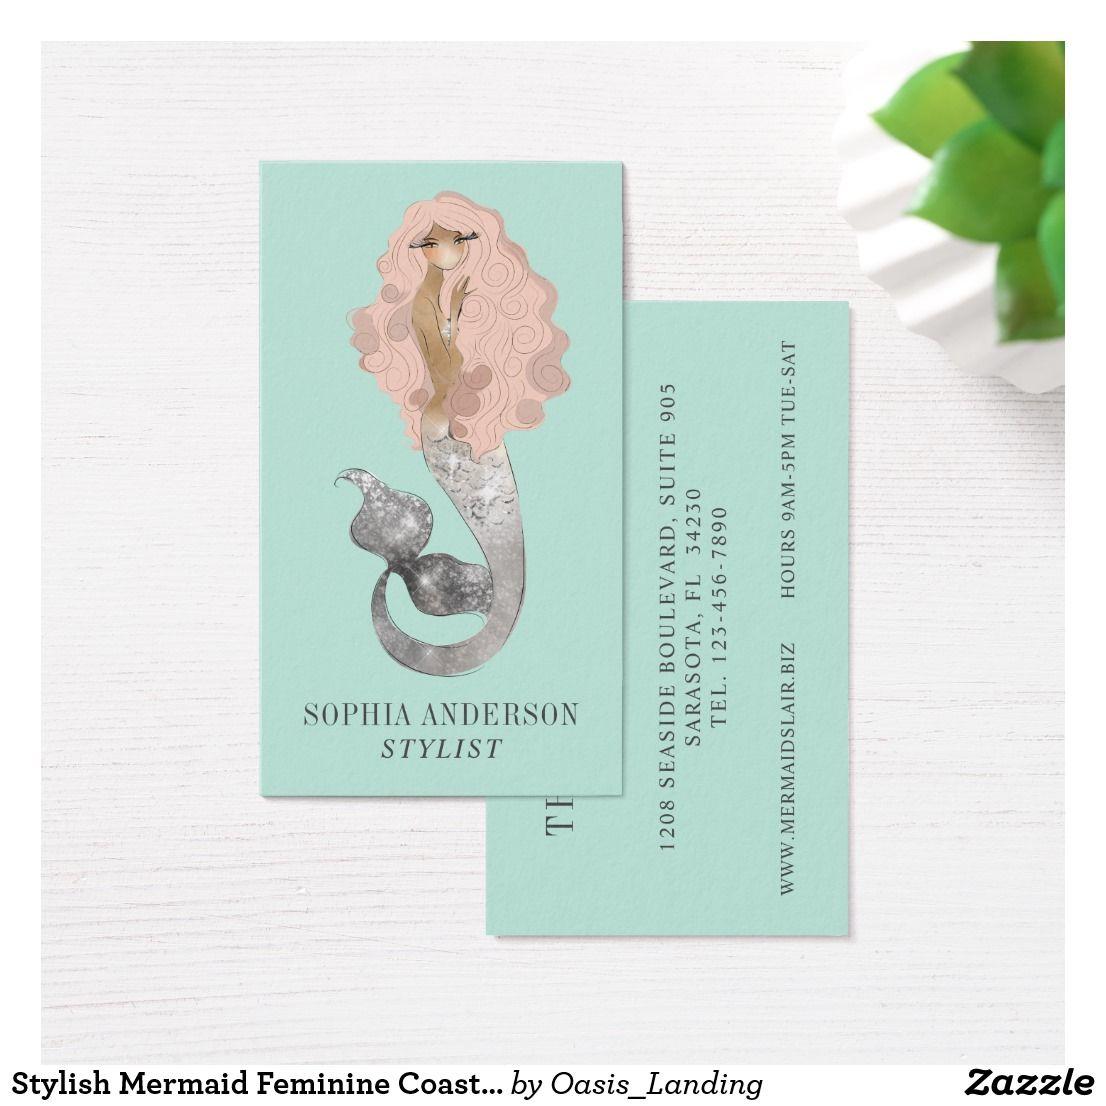 Stylish Mermaid Feminine Coastal Business Card | Business cards ...